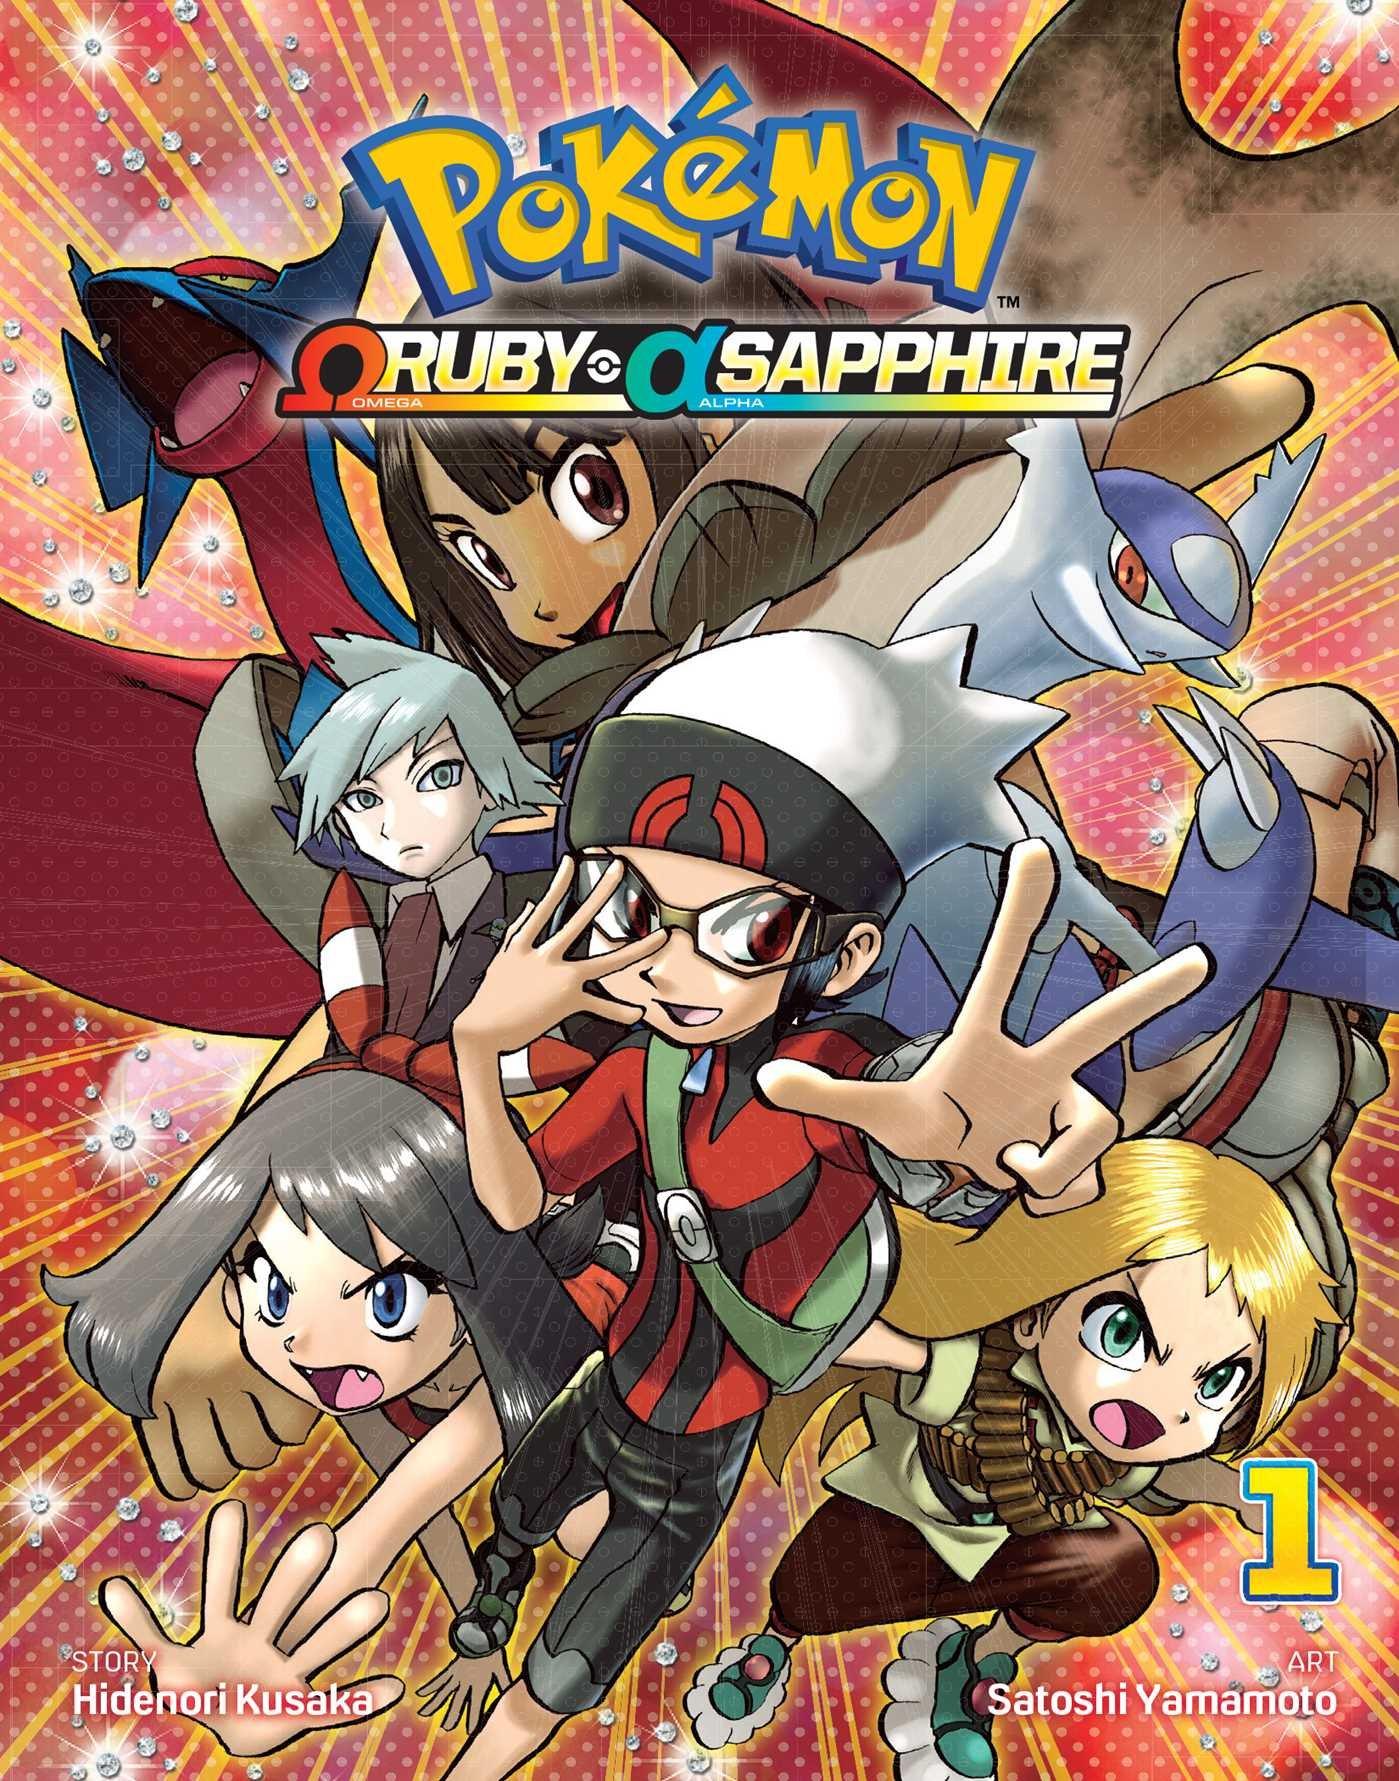 Pok%C3%A9mon Omega Alpha Sapphire Pokemon product image